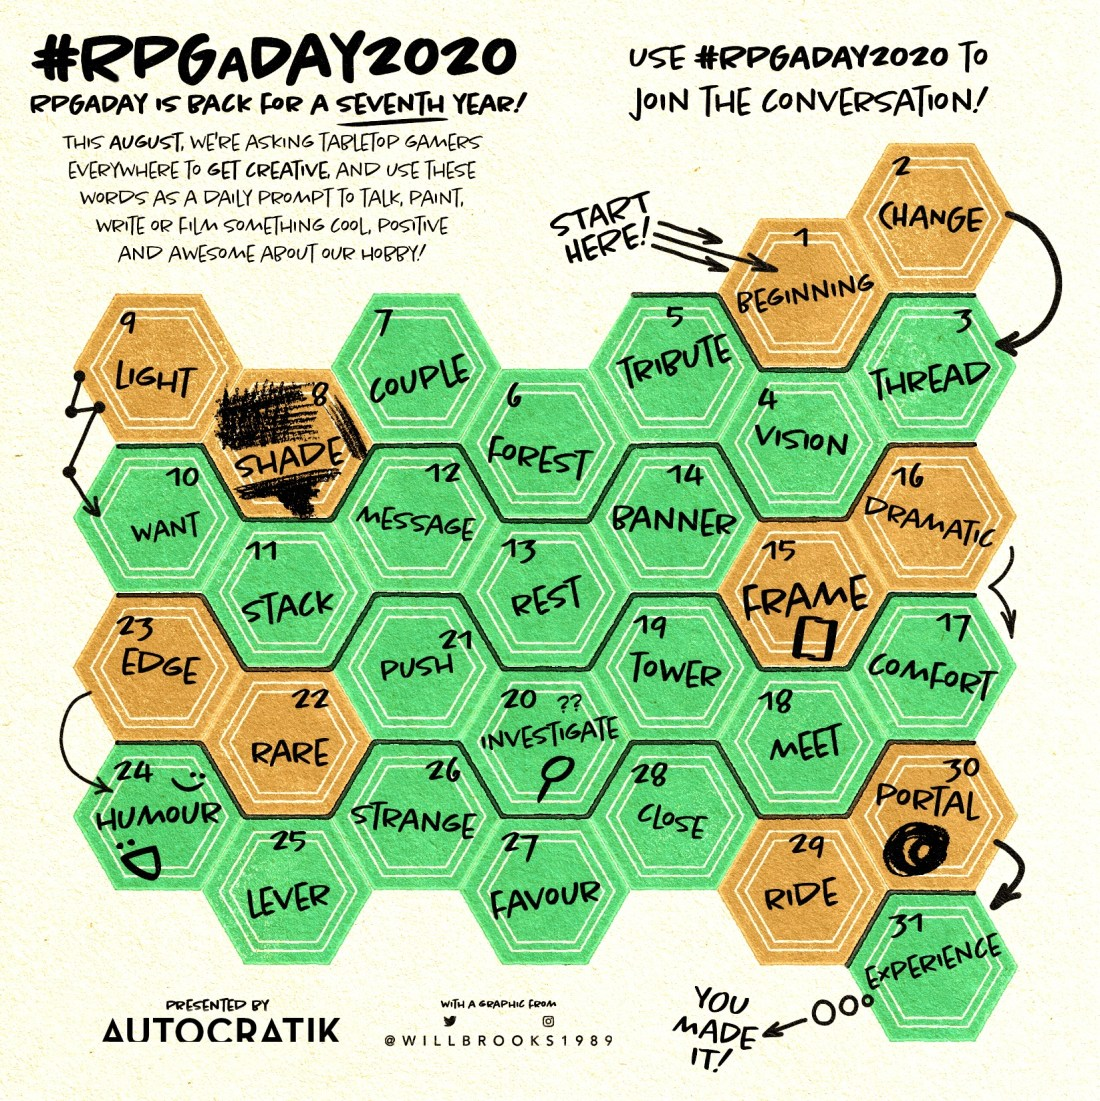 RPGaDay2020 graphic